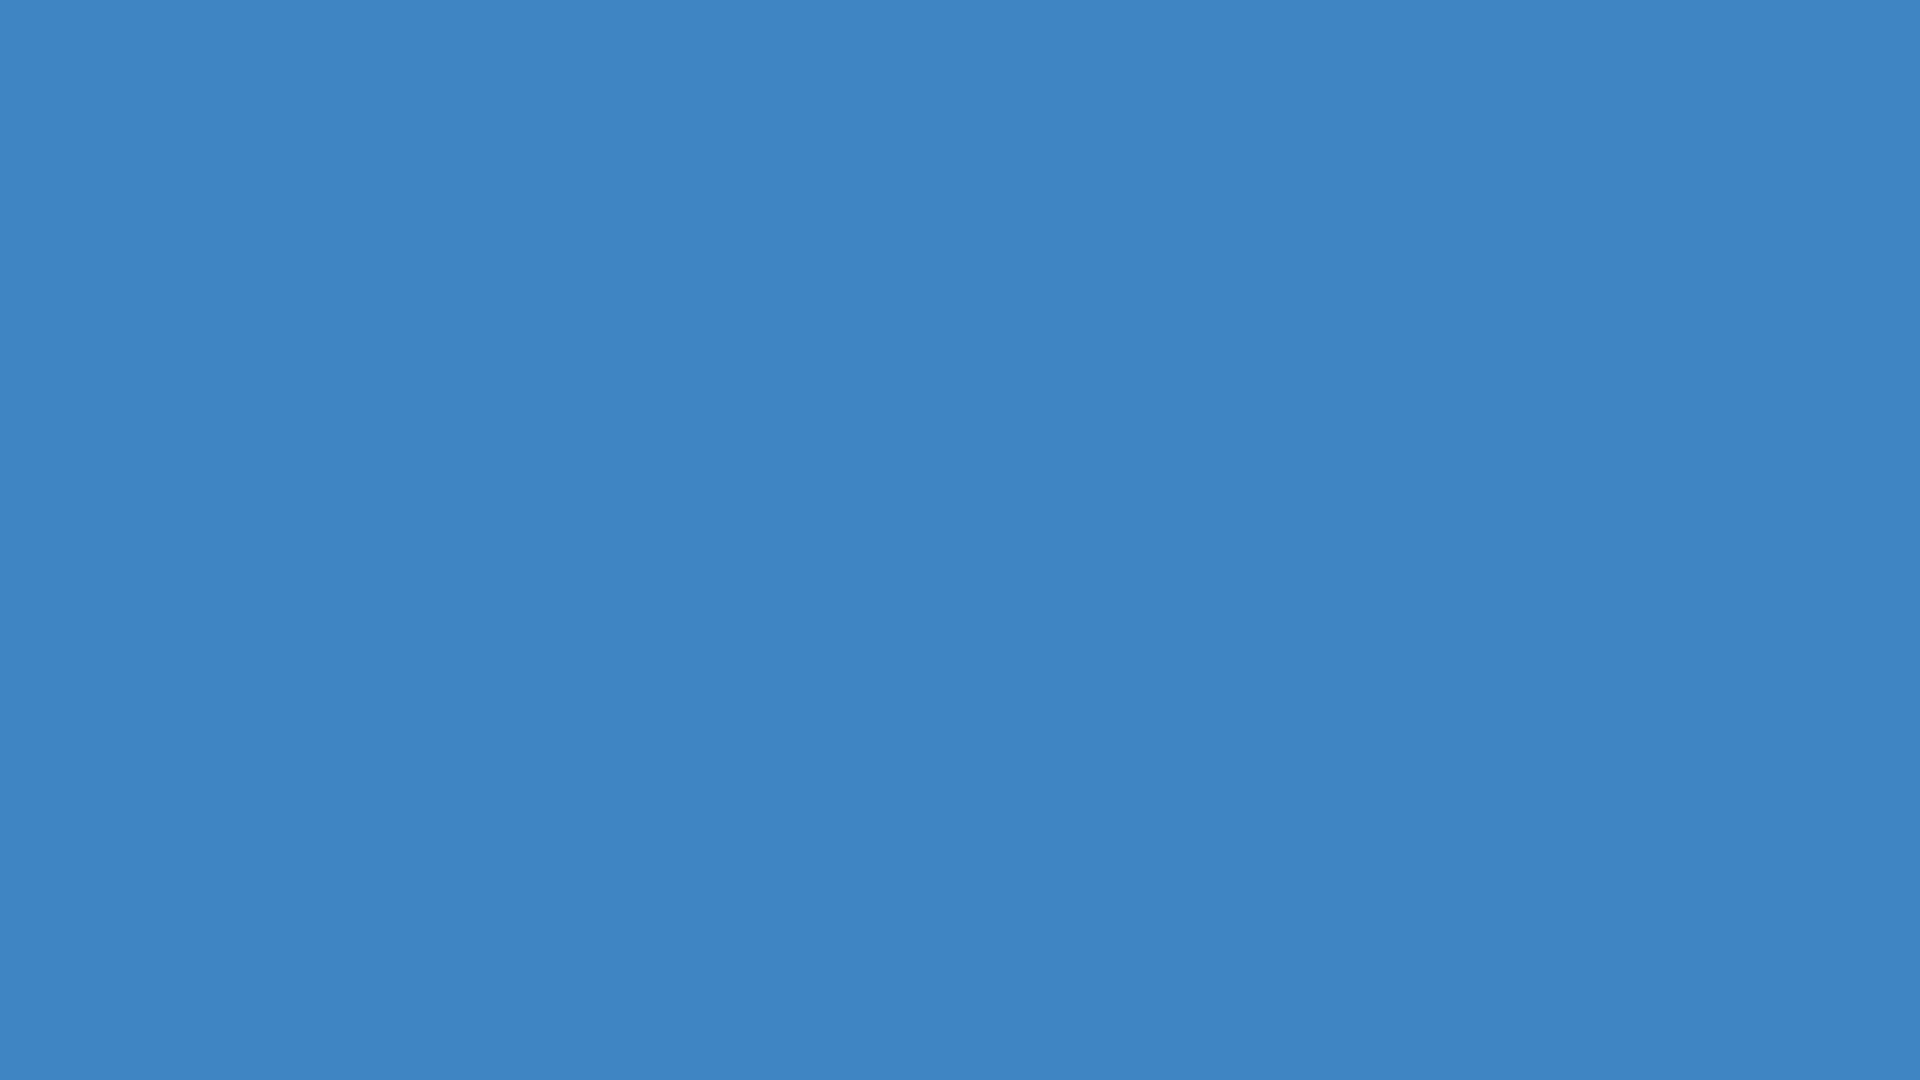 fondo azul plano